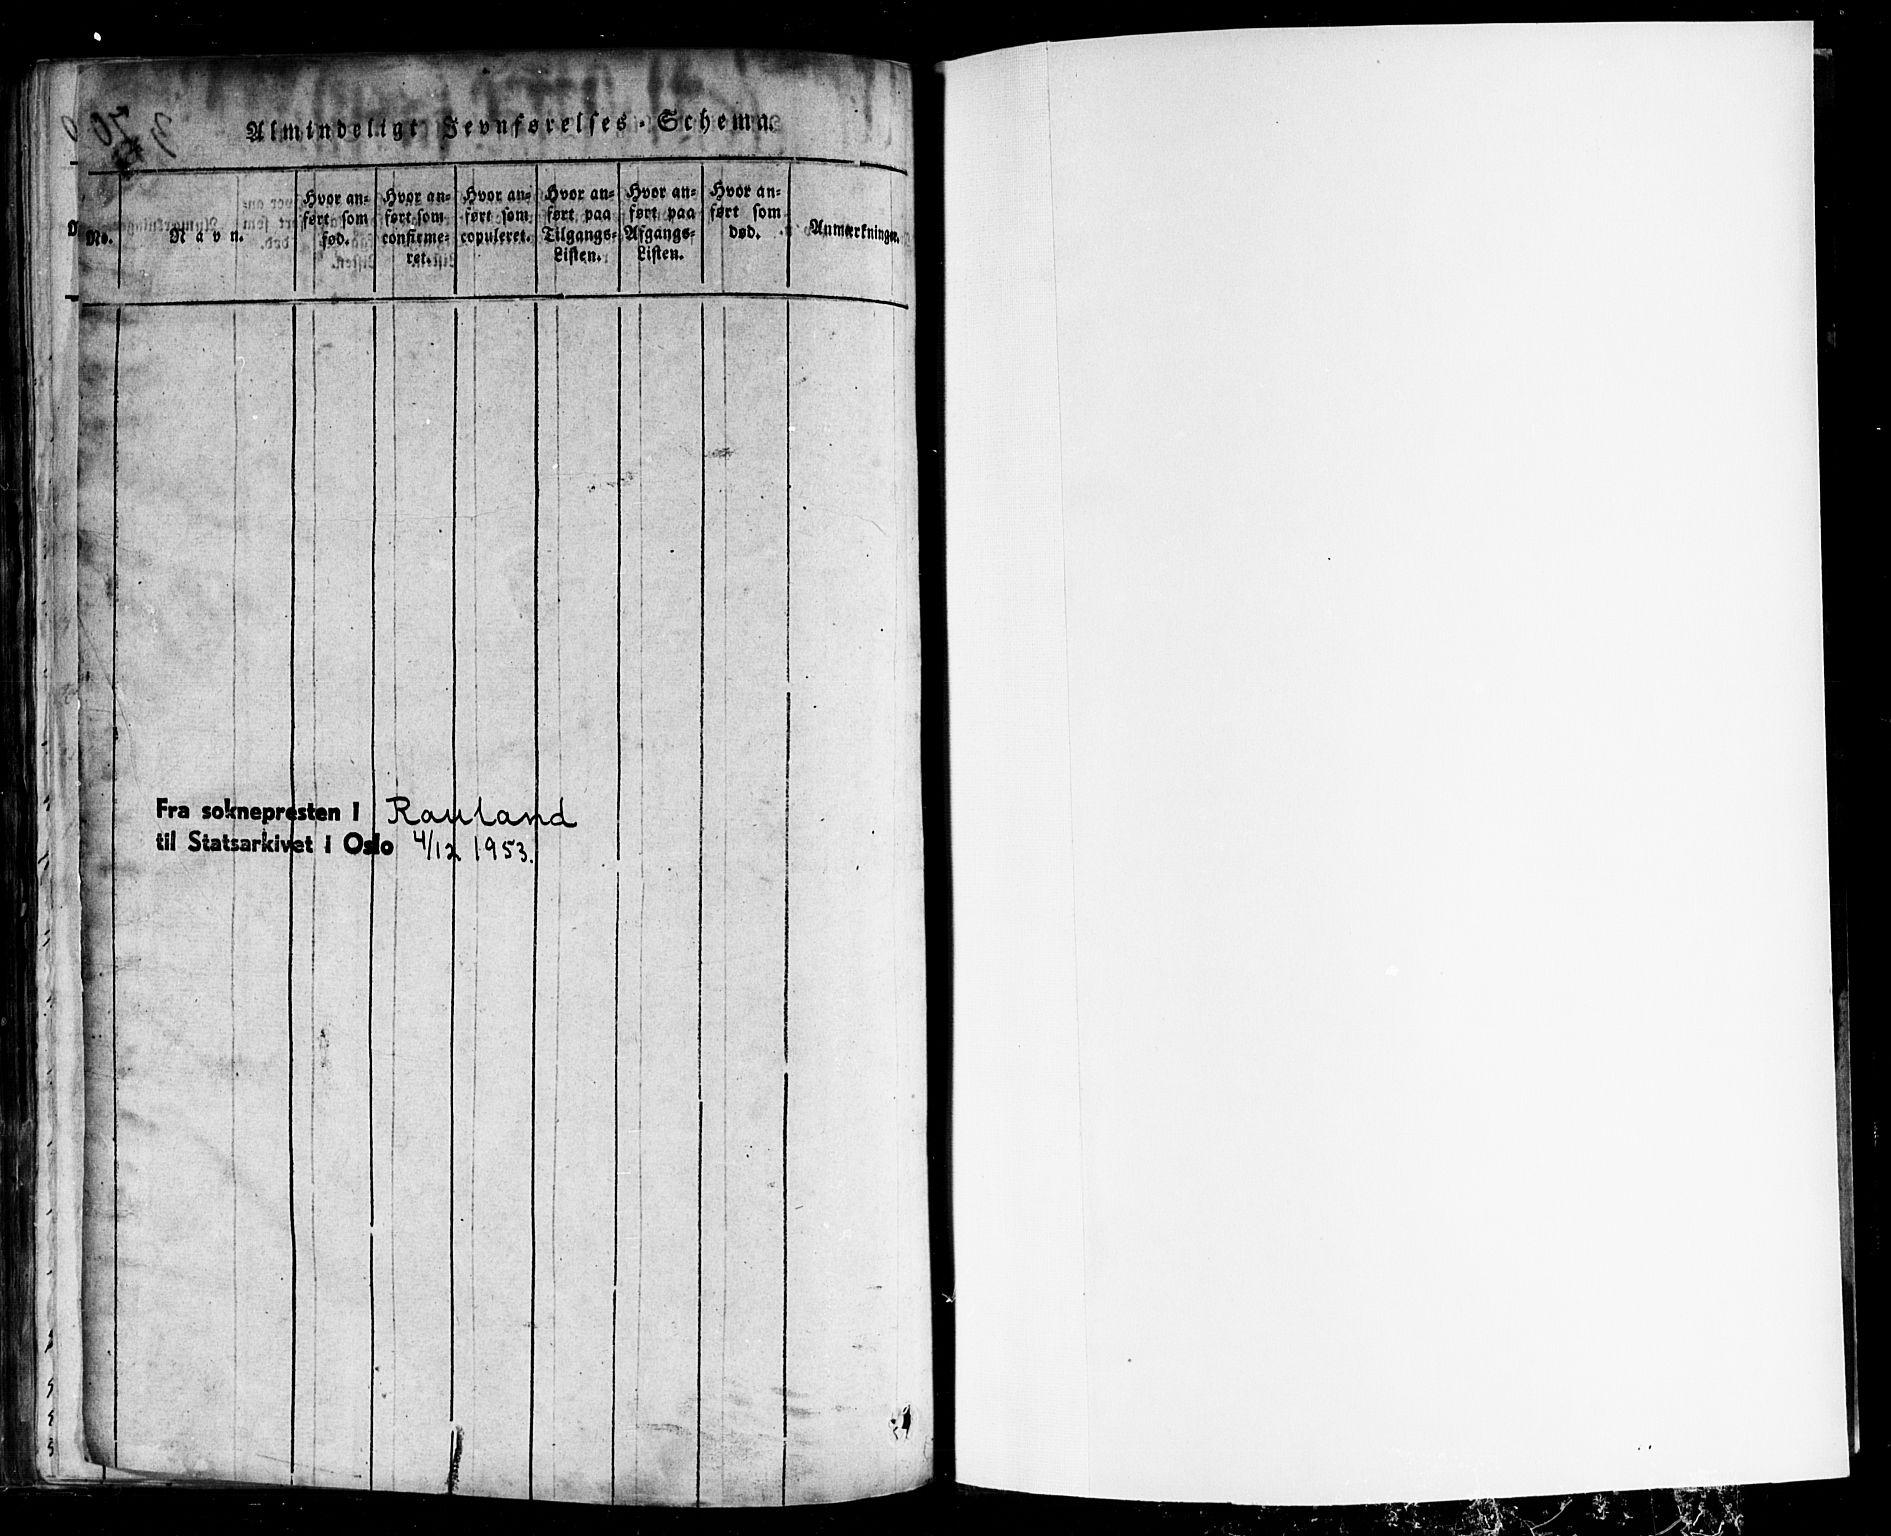 SAKO, Rauland kirkebøker, F/Fa/L0002: Ministerialbok nr. 2, 1815-1860